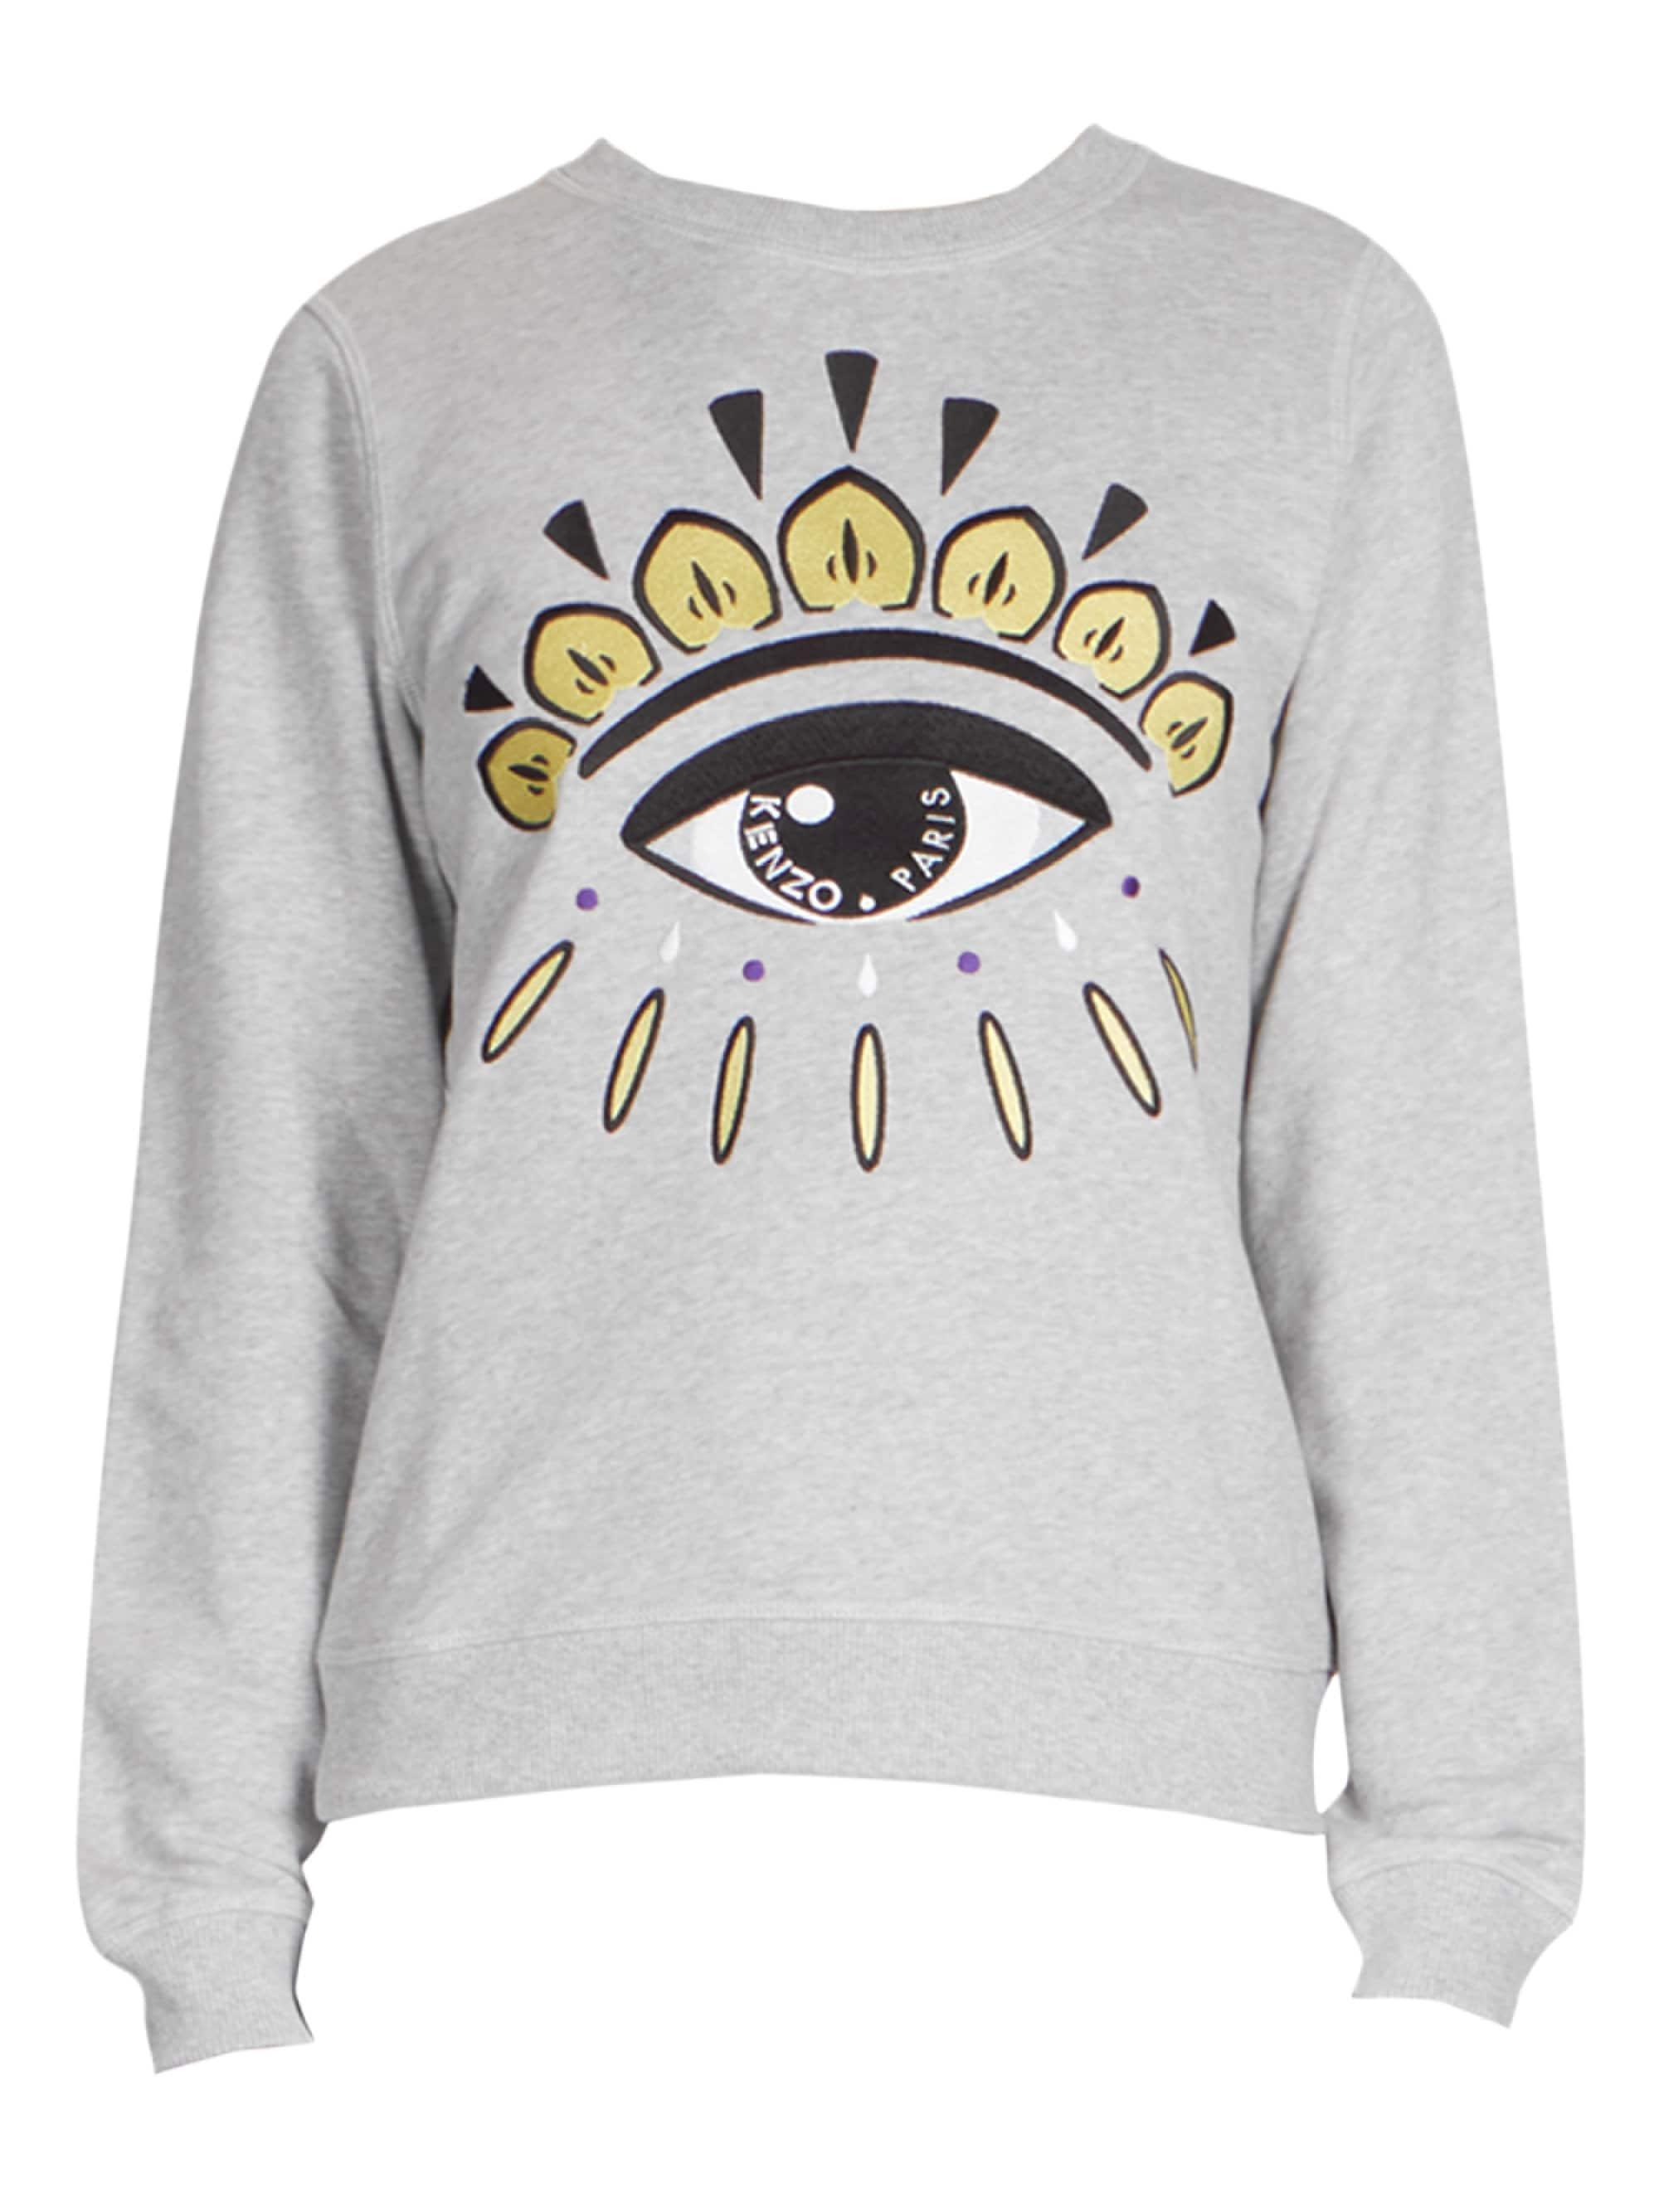 a417d5314 KENZO Eye Graphic Sweatshirt in Gray - Lyst